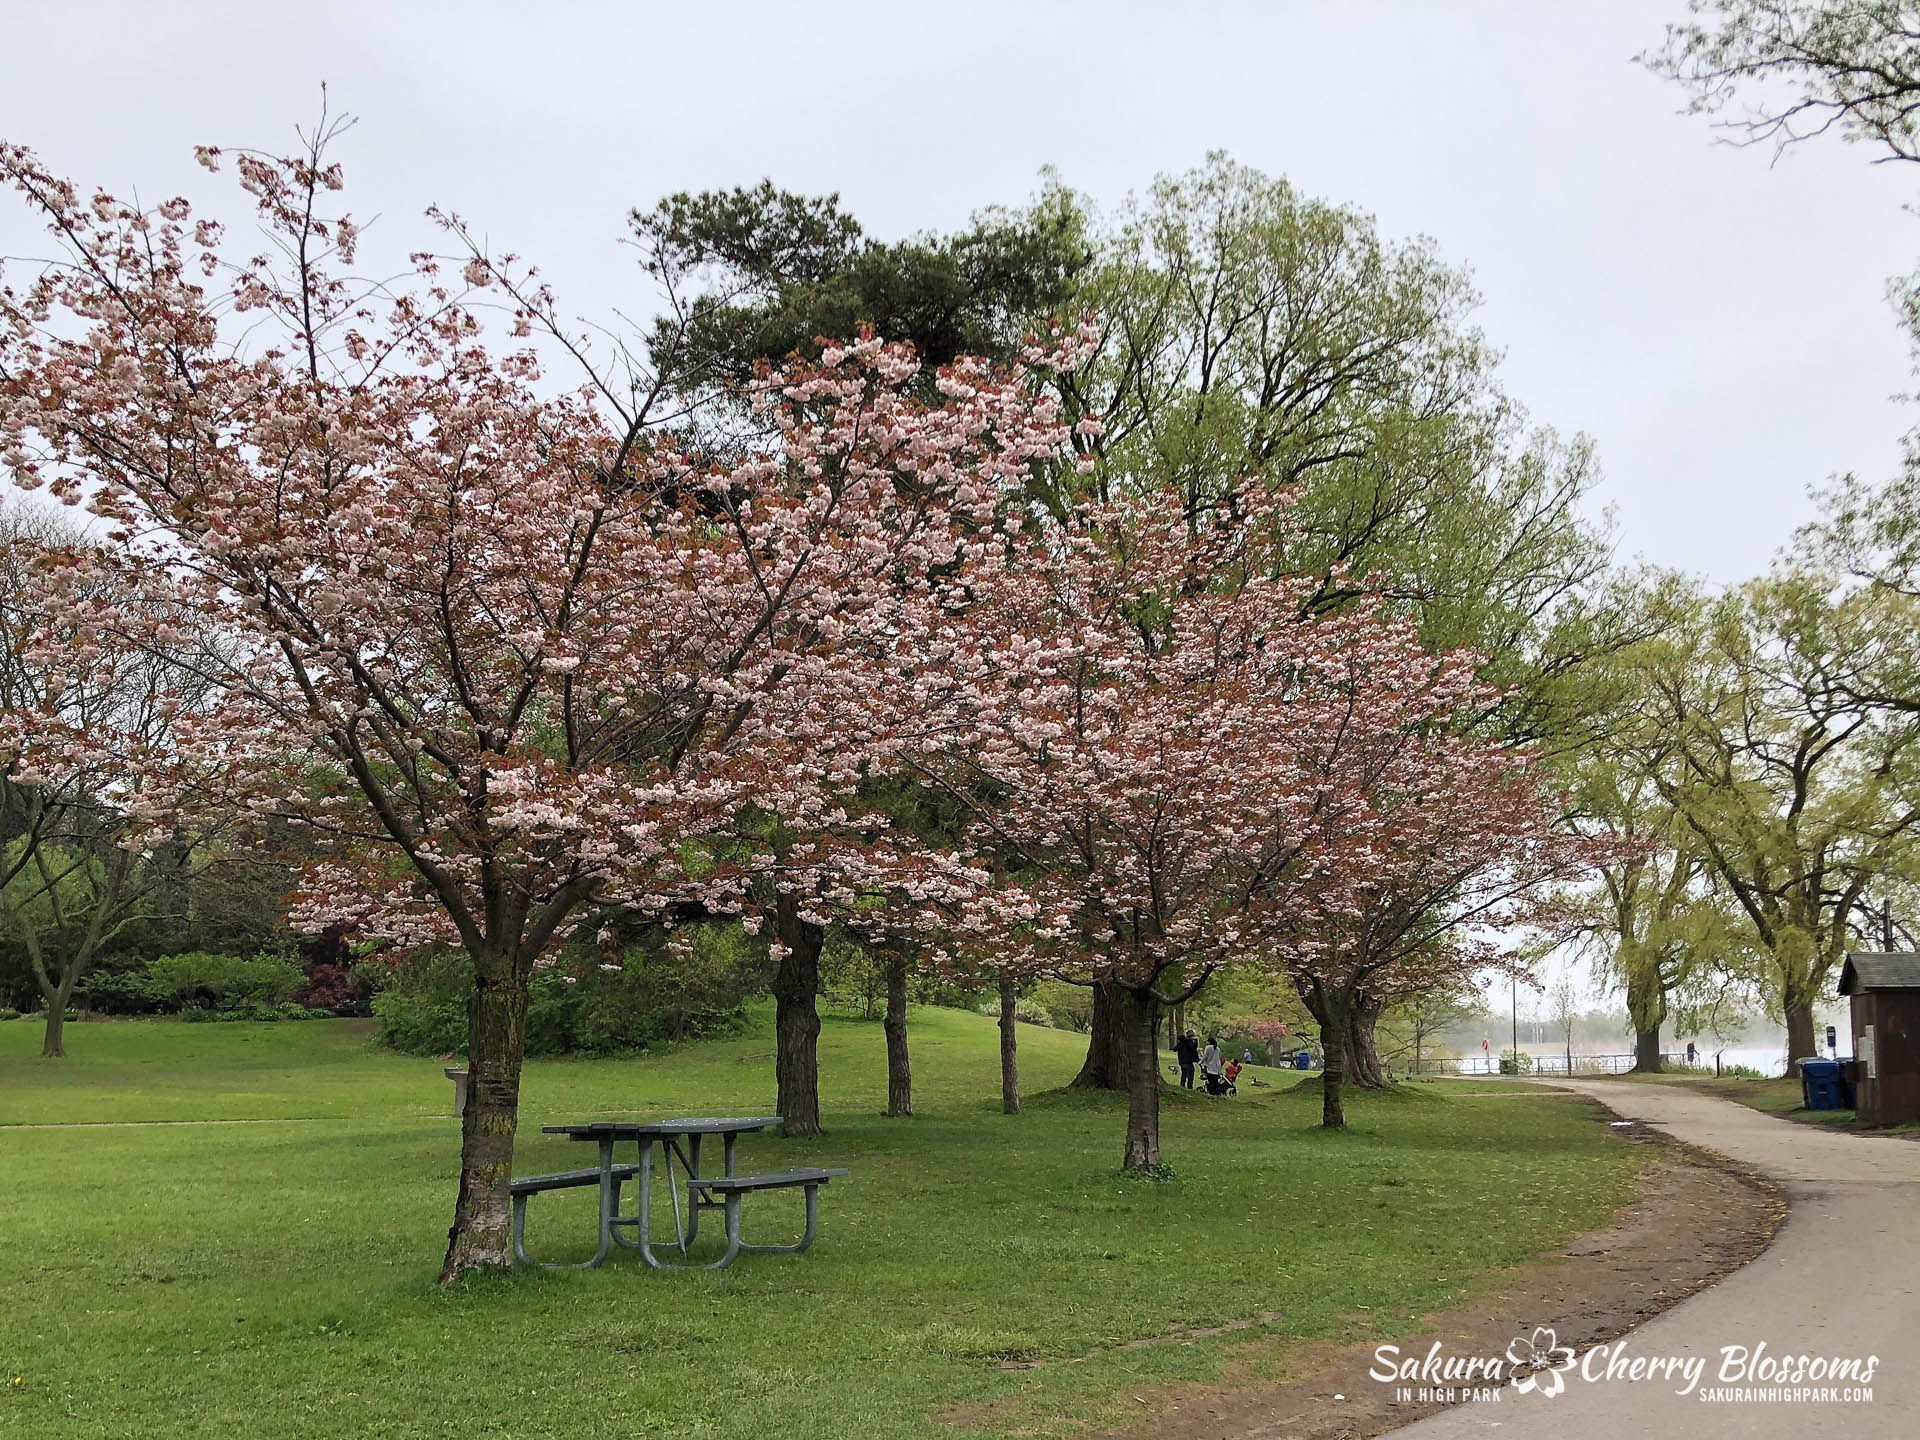 Sakura-Watch-May-22-2018-31.jpg